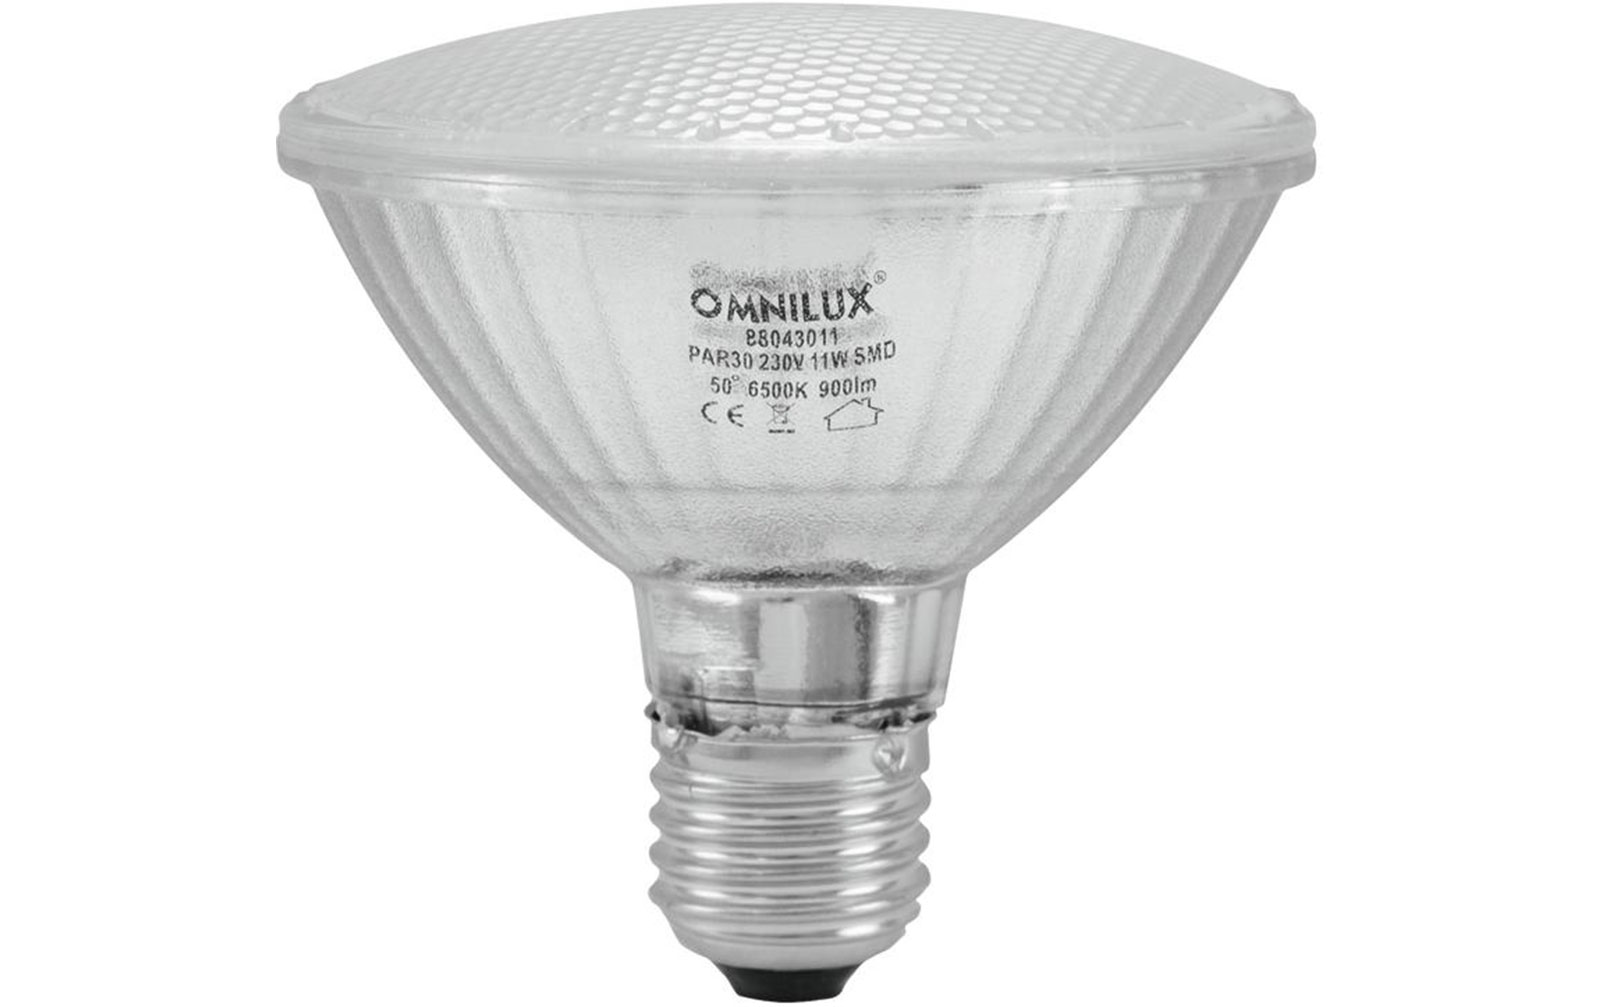 omnilux-par-30-230v-smd-11w-e-27-led-6500k